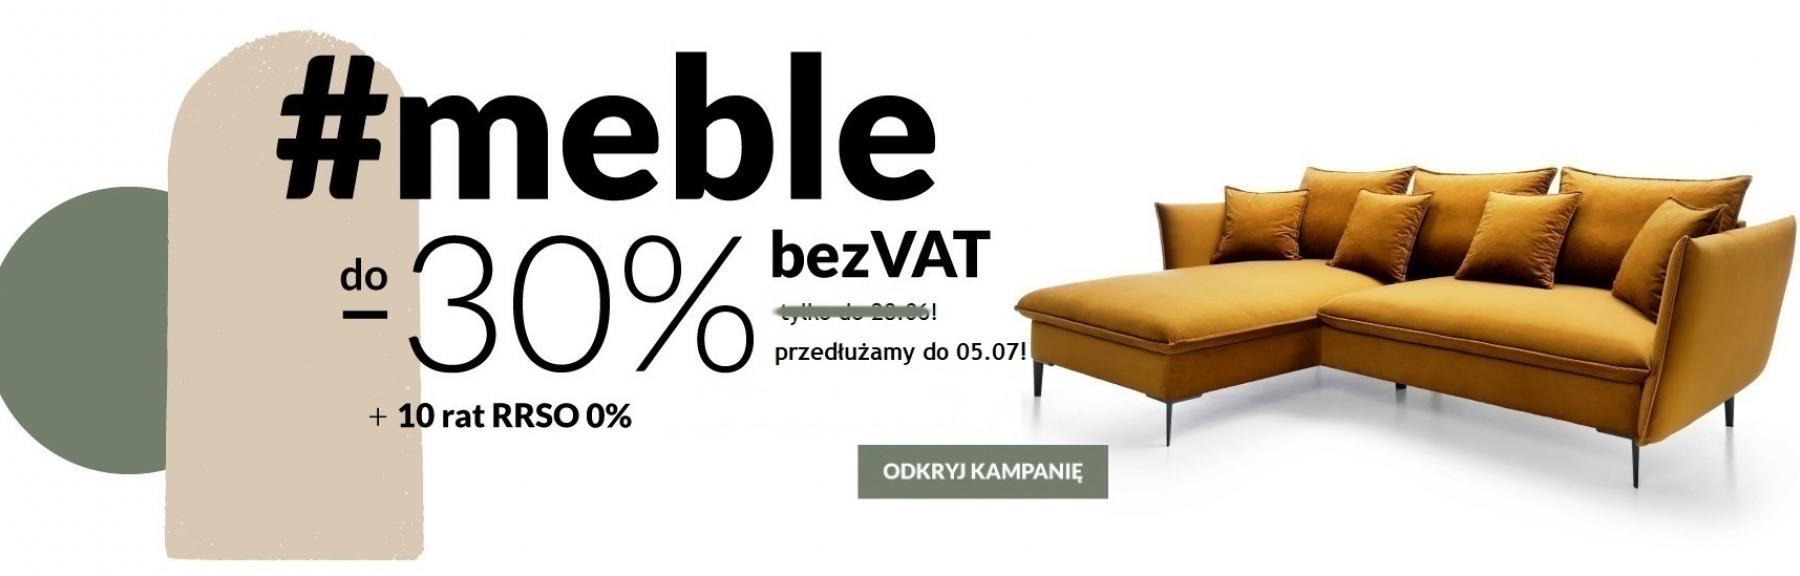 Lectus Lectus: do 30% rabatu na meble z kategorii meble bez VAT